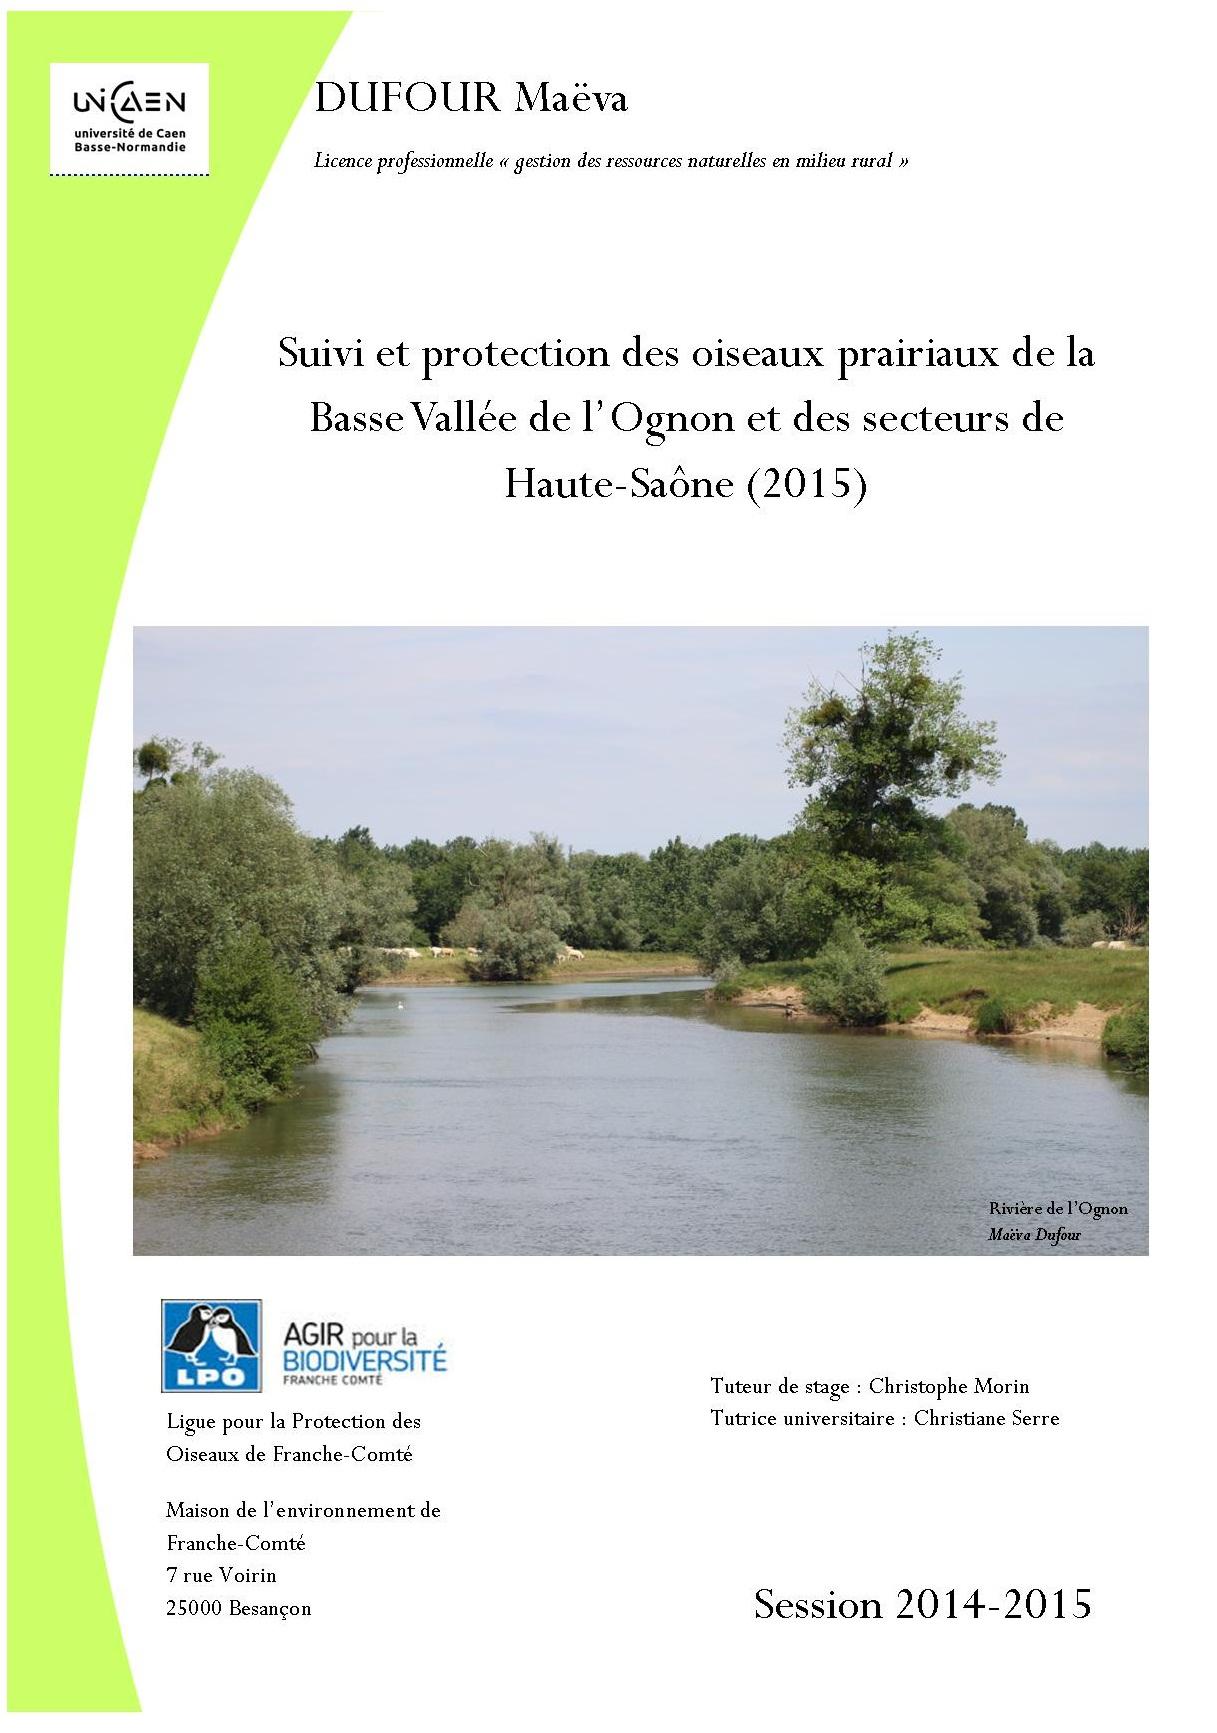 https://cdnfiles1.biolovision.net/franche-comte.lpo.fr/userfiles/publications/rapportsstages/2015RapportPRCEOisprairiauxMavaDufourcouv.jpg